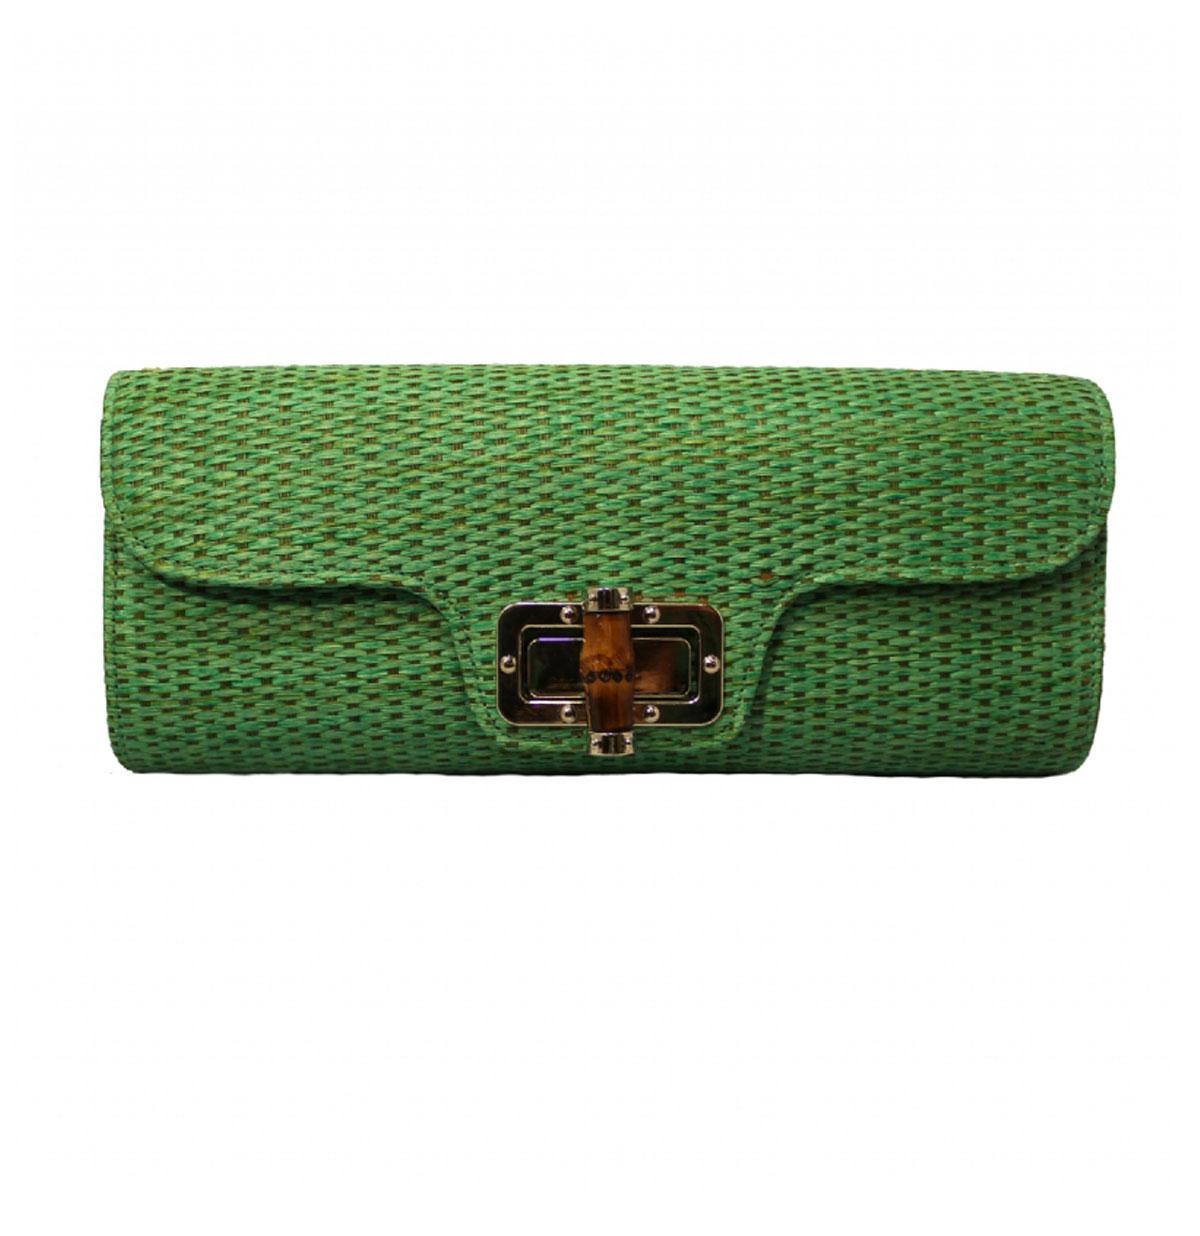 Bamboo Clutch Green